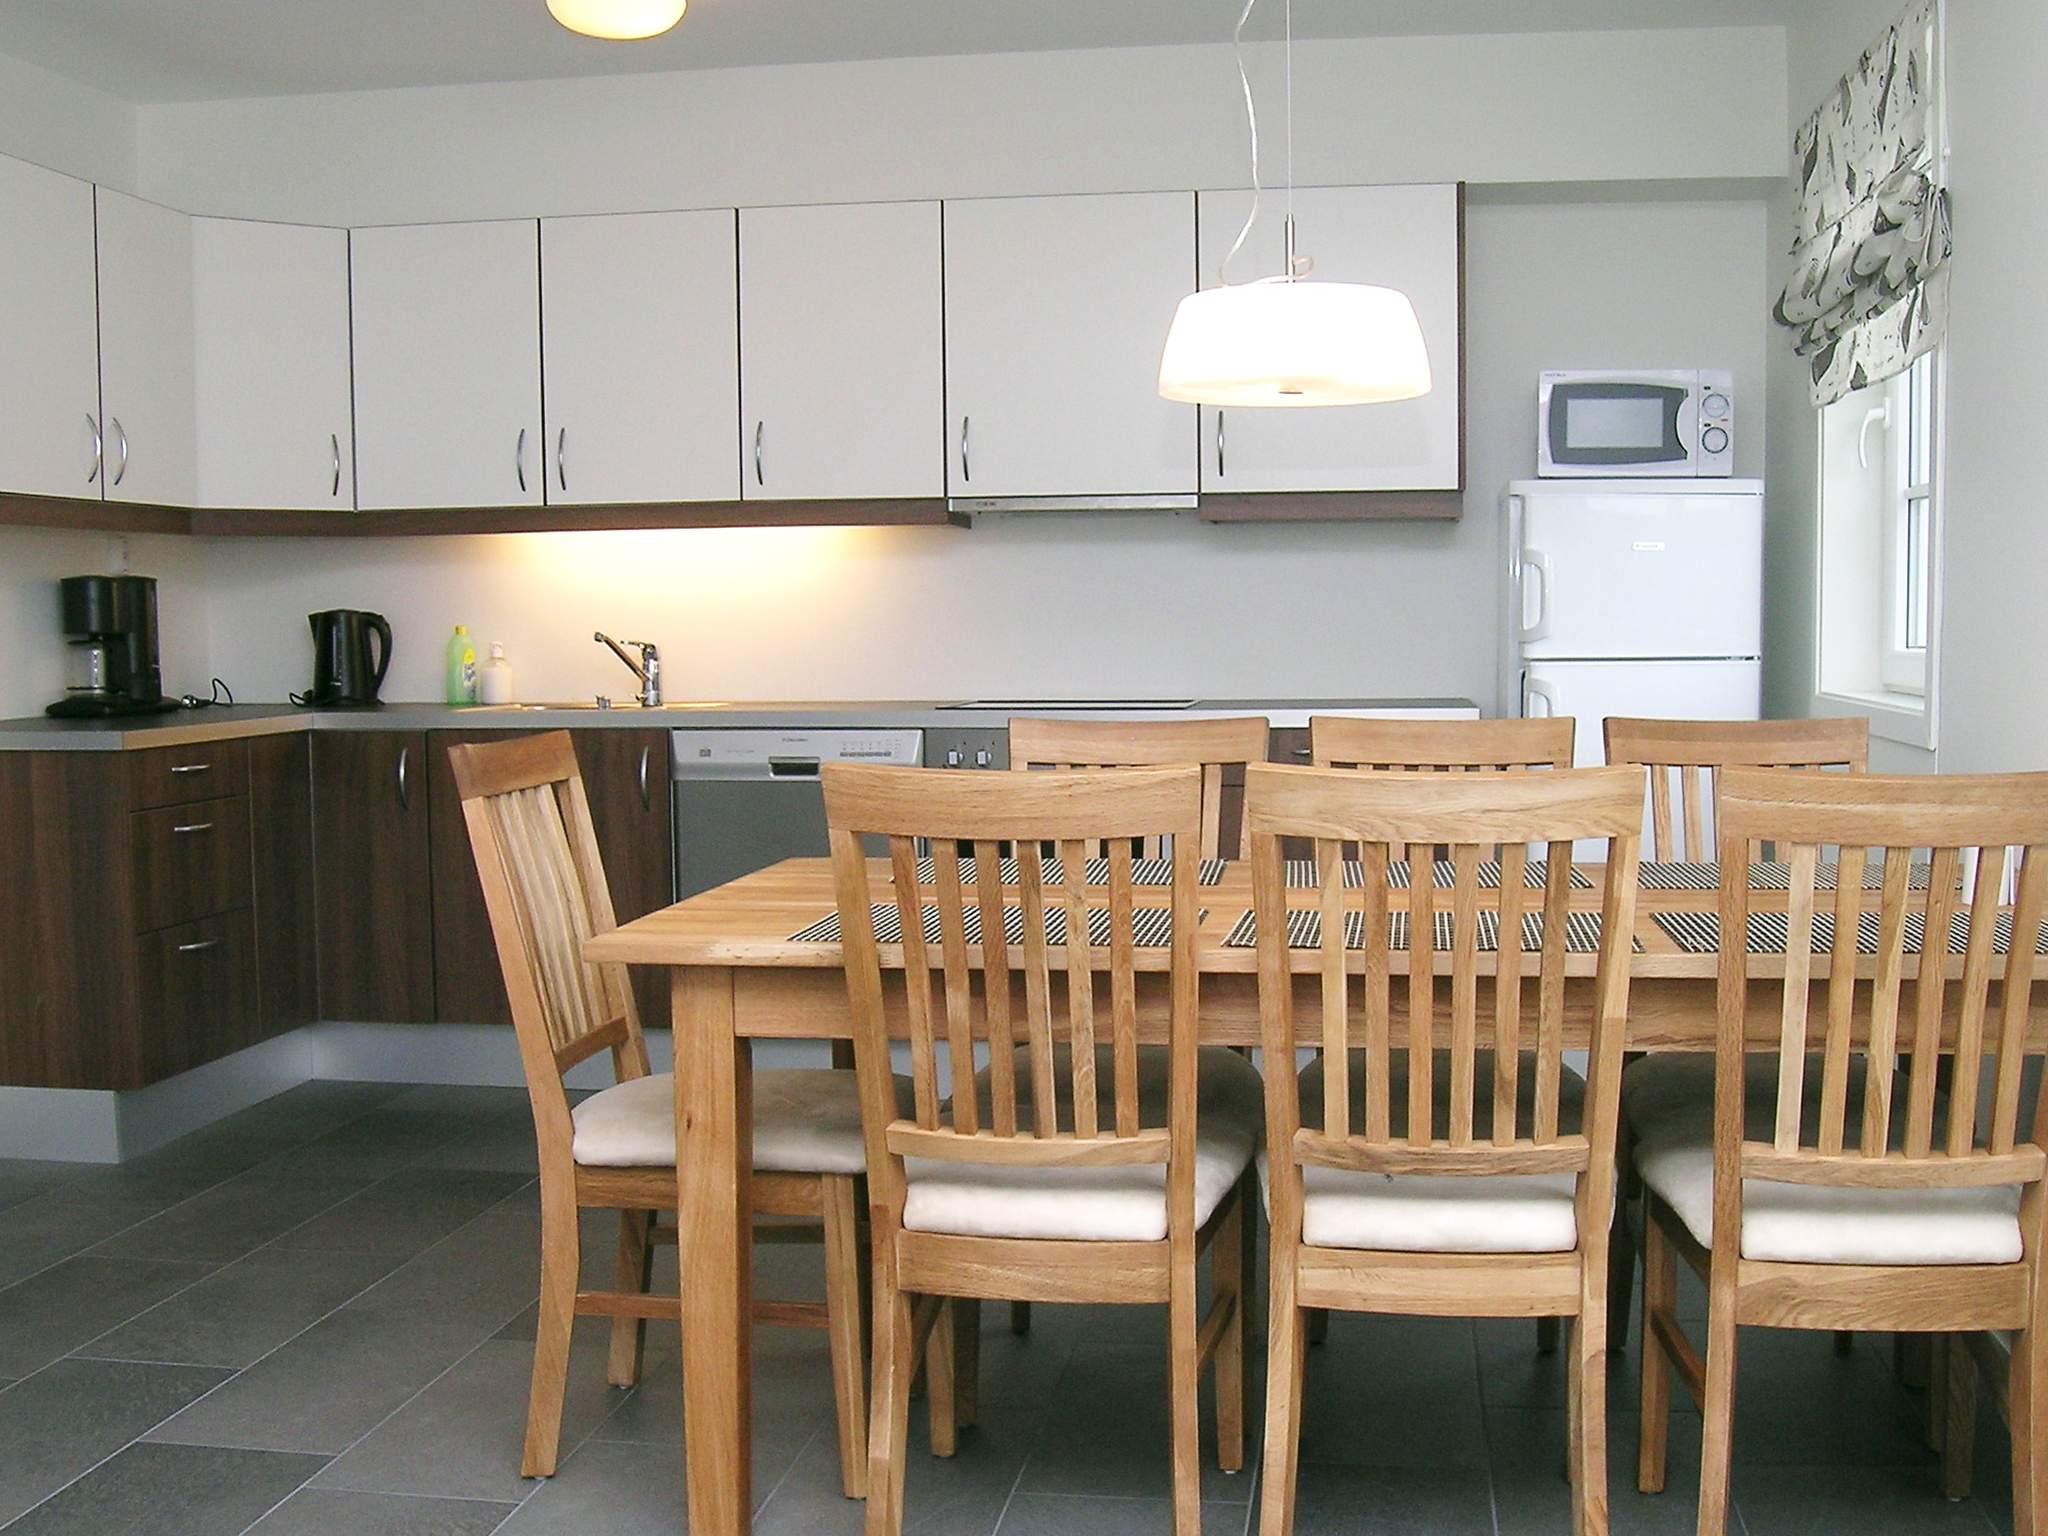 Ferienhaus Mølstrevåg (365130), Sveio, Hordaland - Hardangerfjord, Westnorwegen, Norwegen, Bild 3